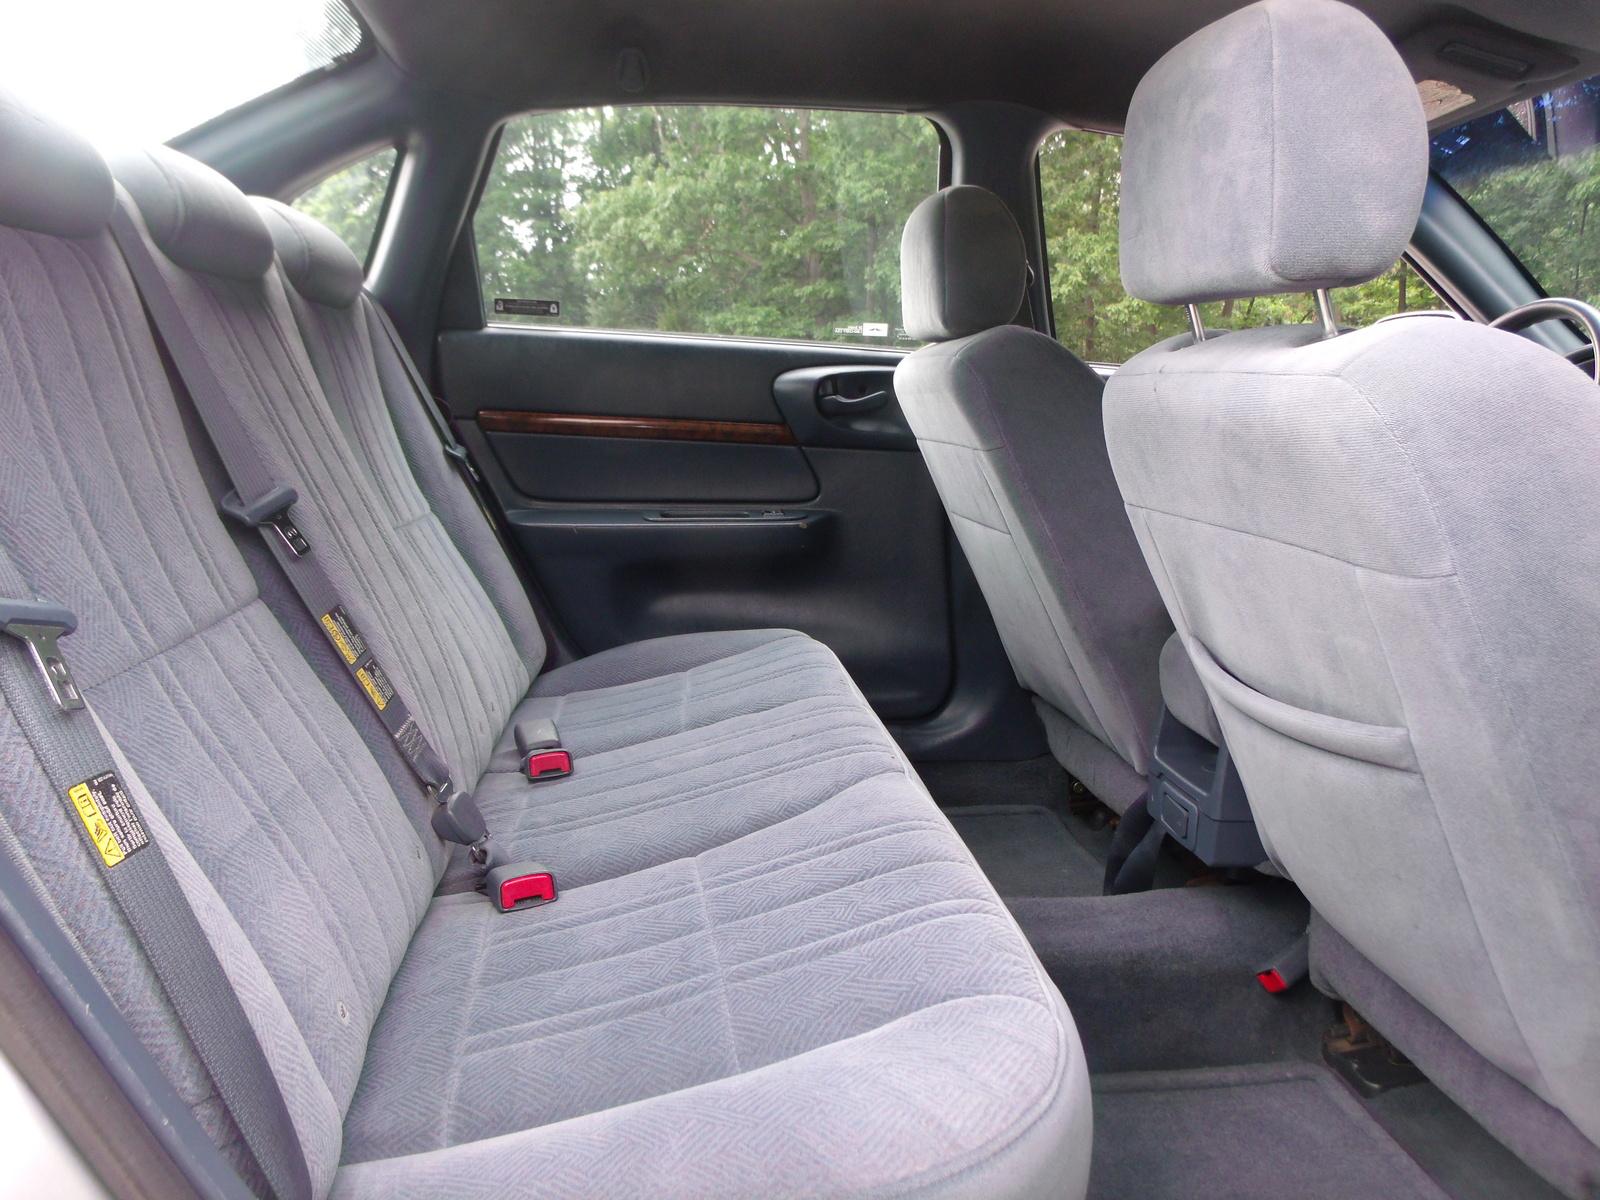 Chevrolet Impala Base Pic on 2001 Chevrolet Malibu Base